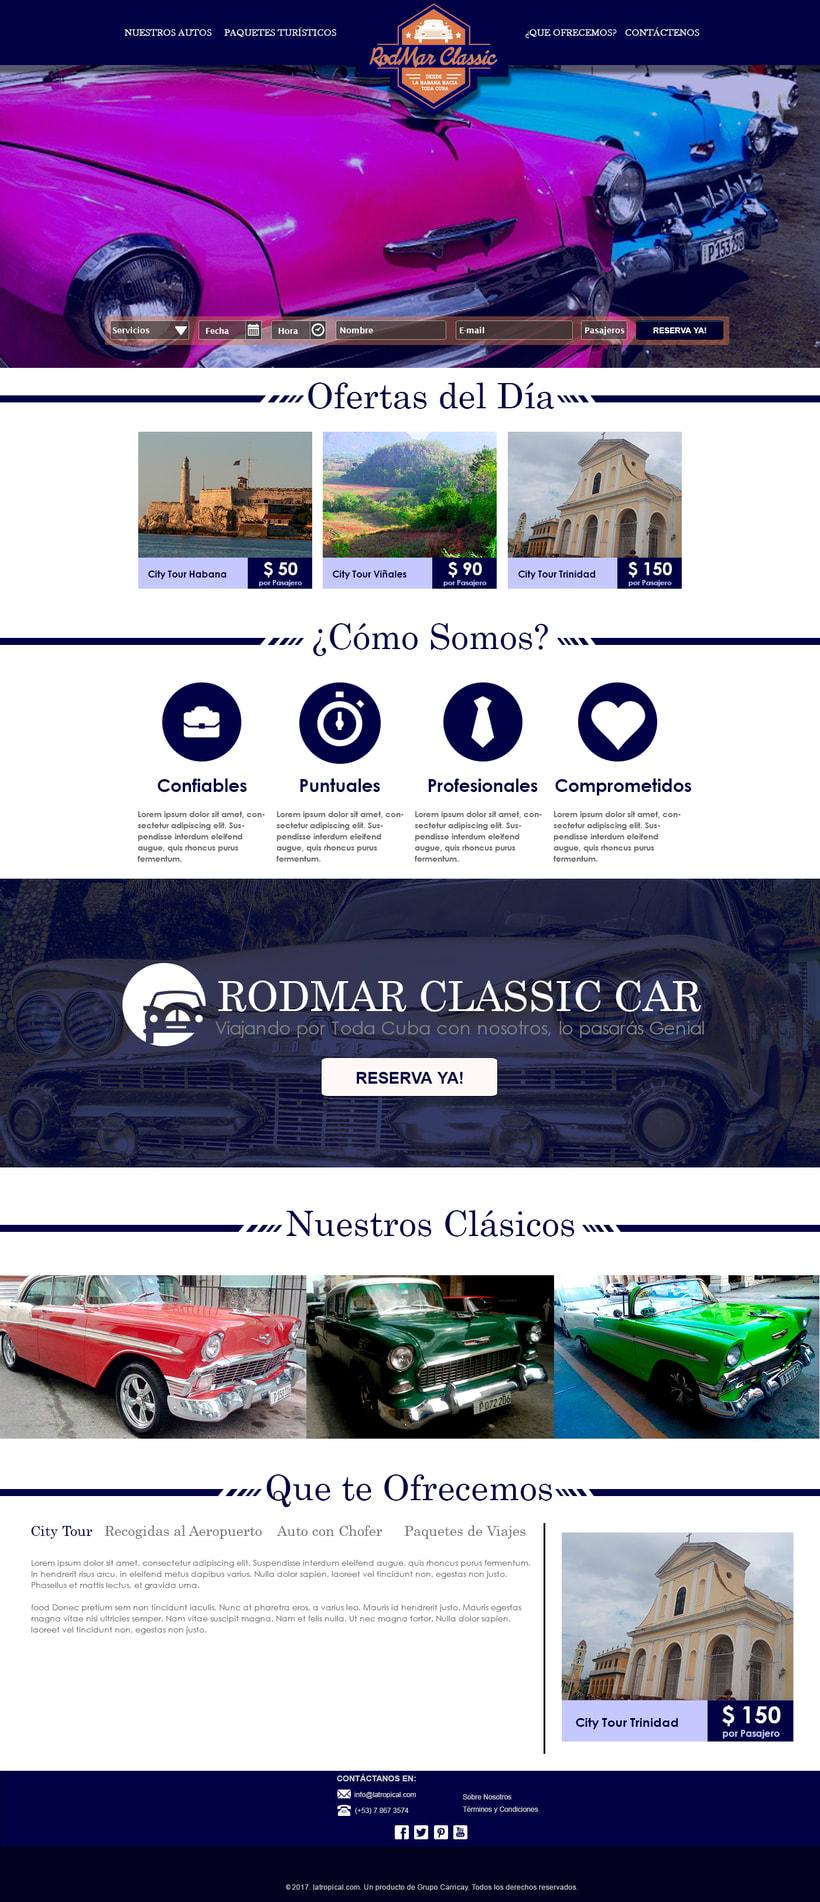 Rodmar Classic Cars -1